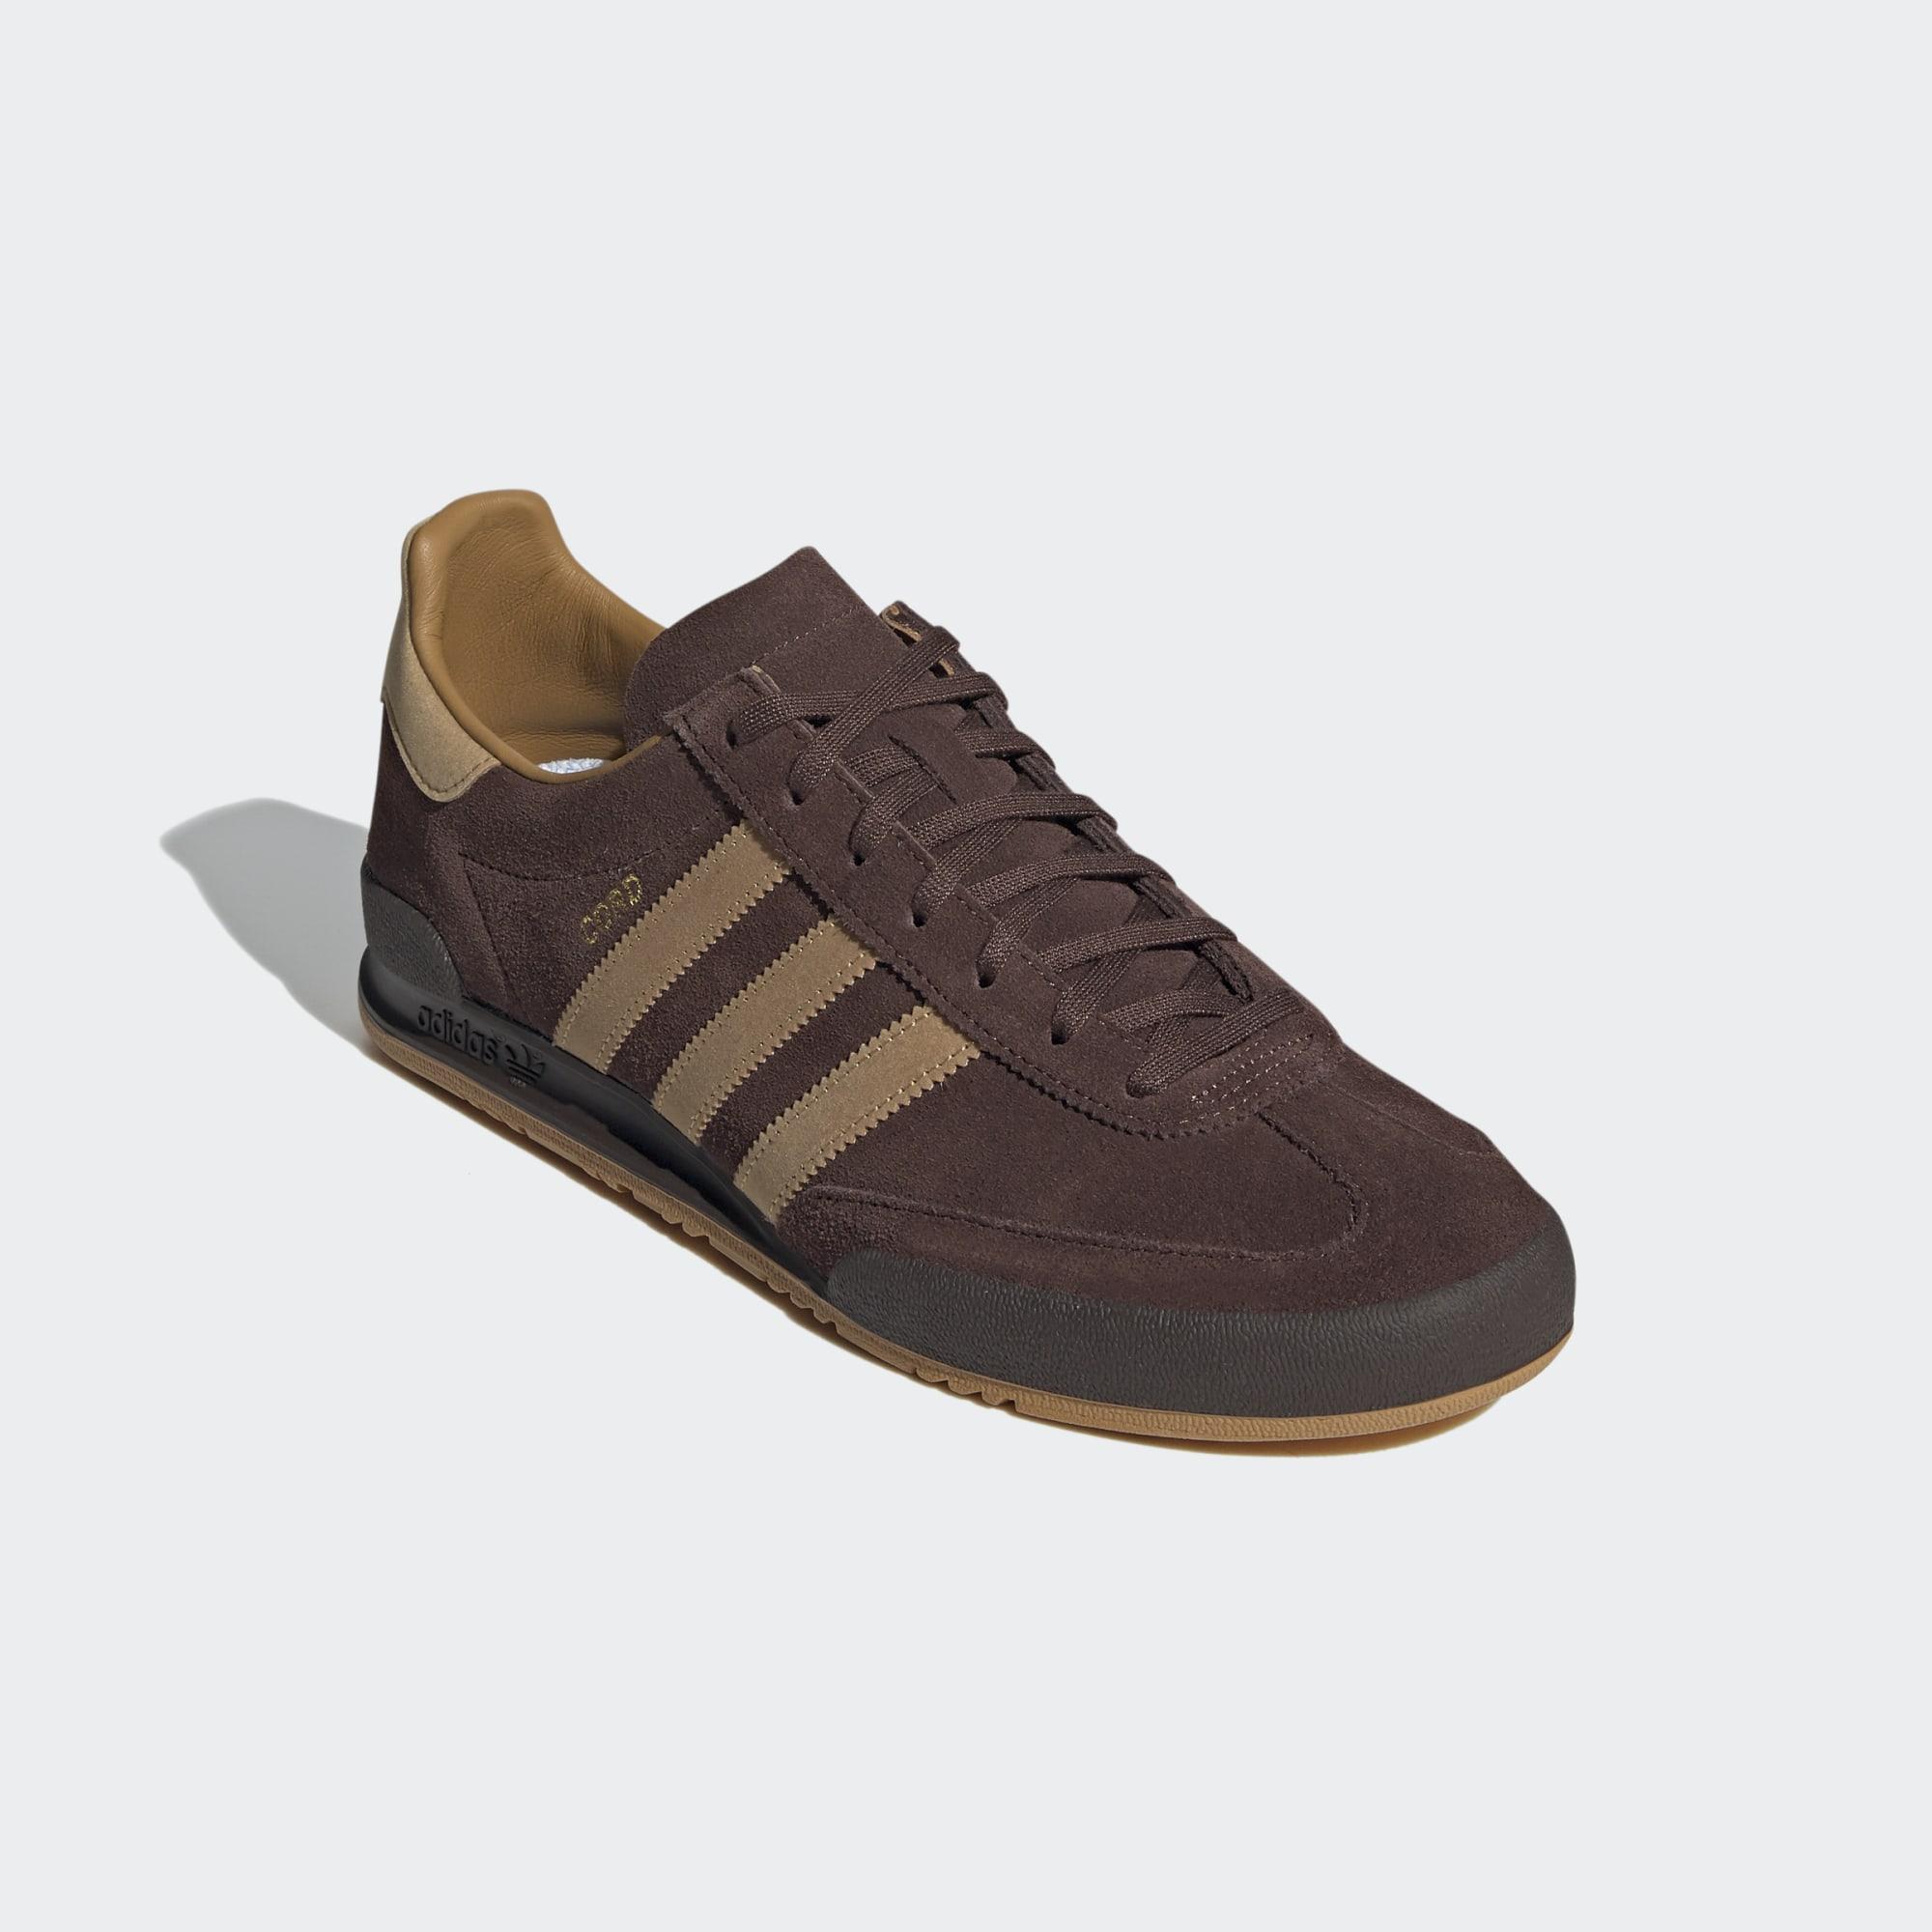 Cord_Shoes_Brun_H67630_04_standard.jpg